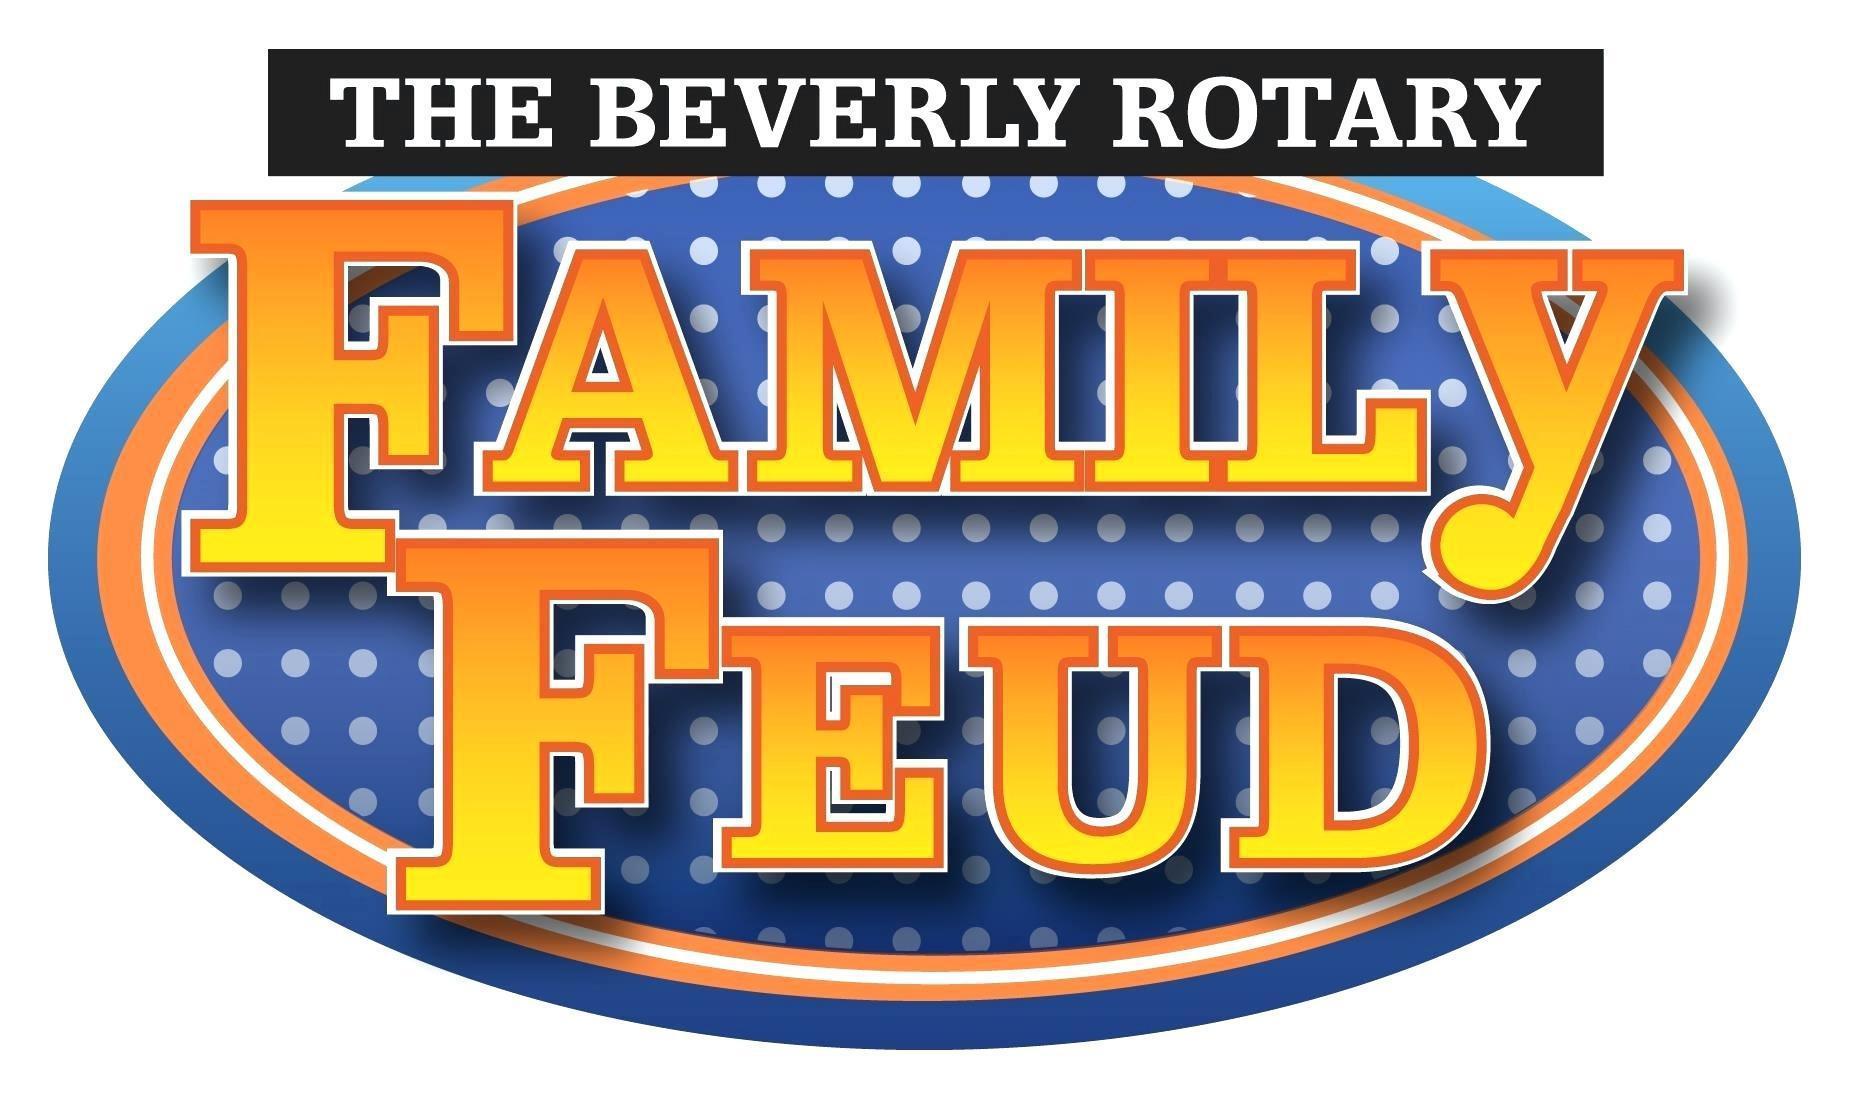 Family feud clipart 3 » Clipart Portal.